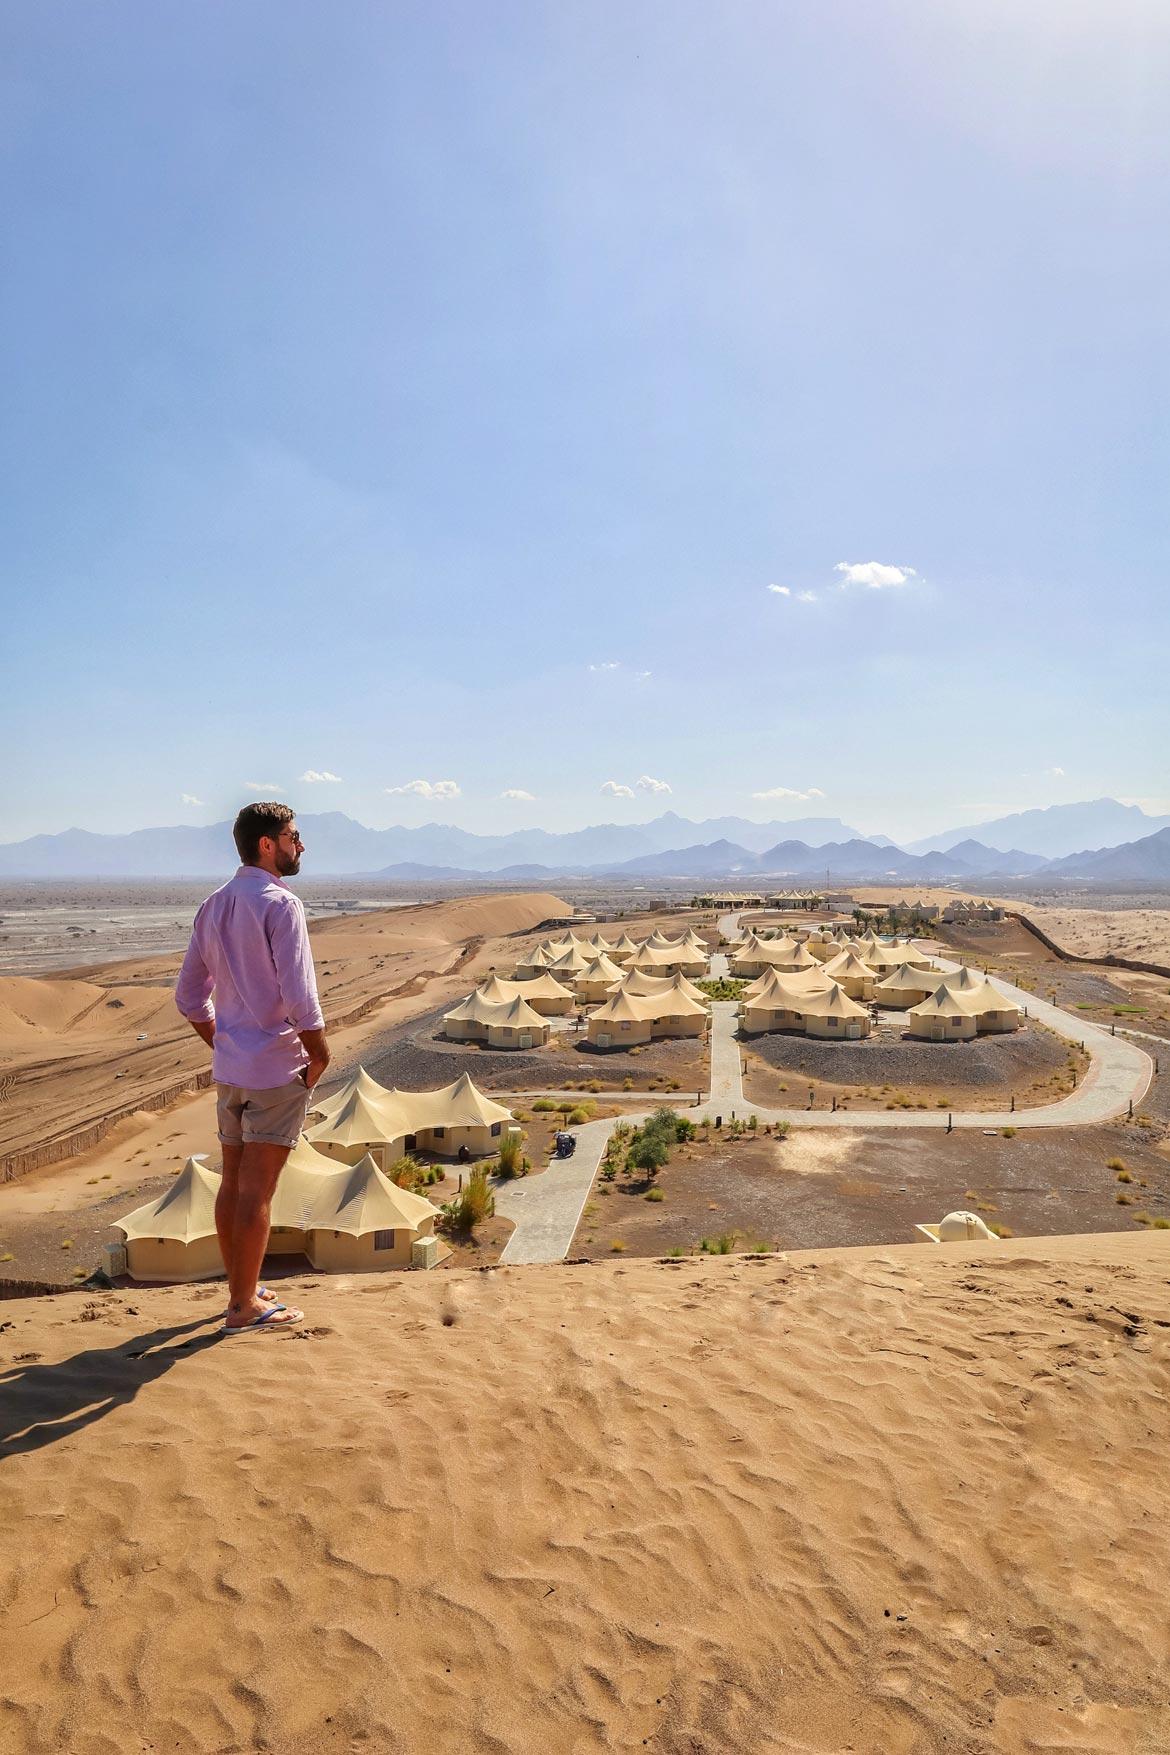 dunes by al nadha oman